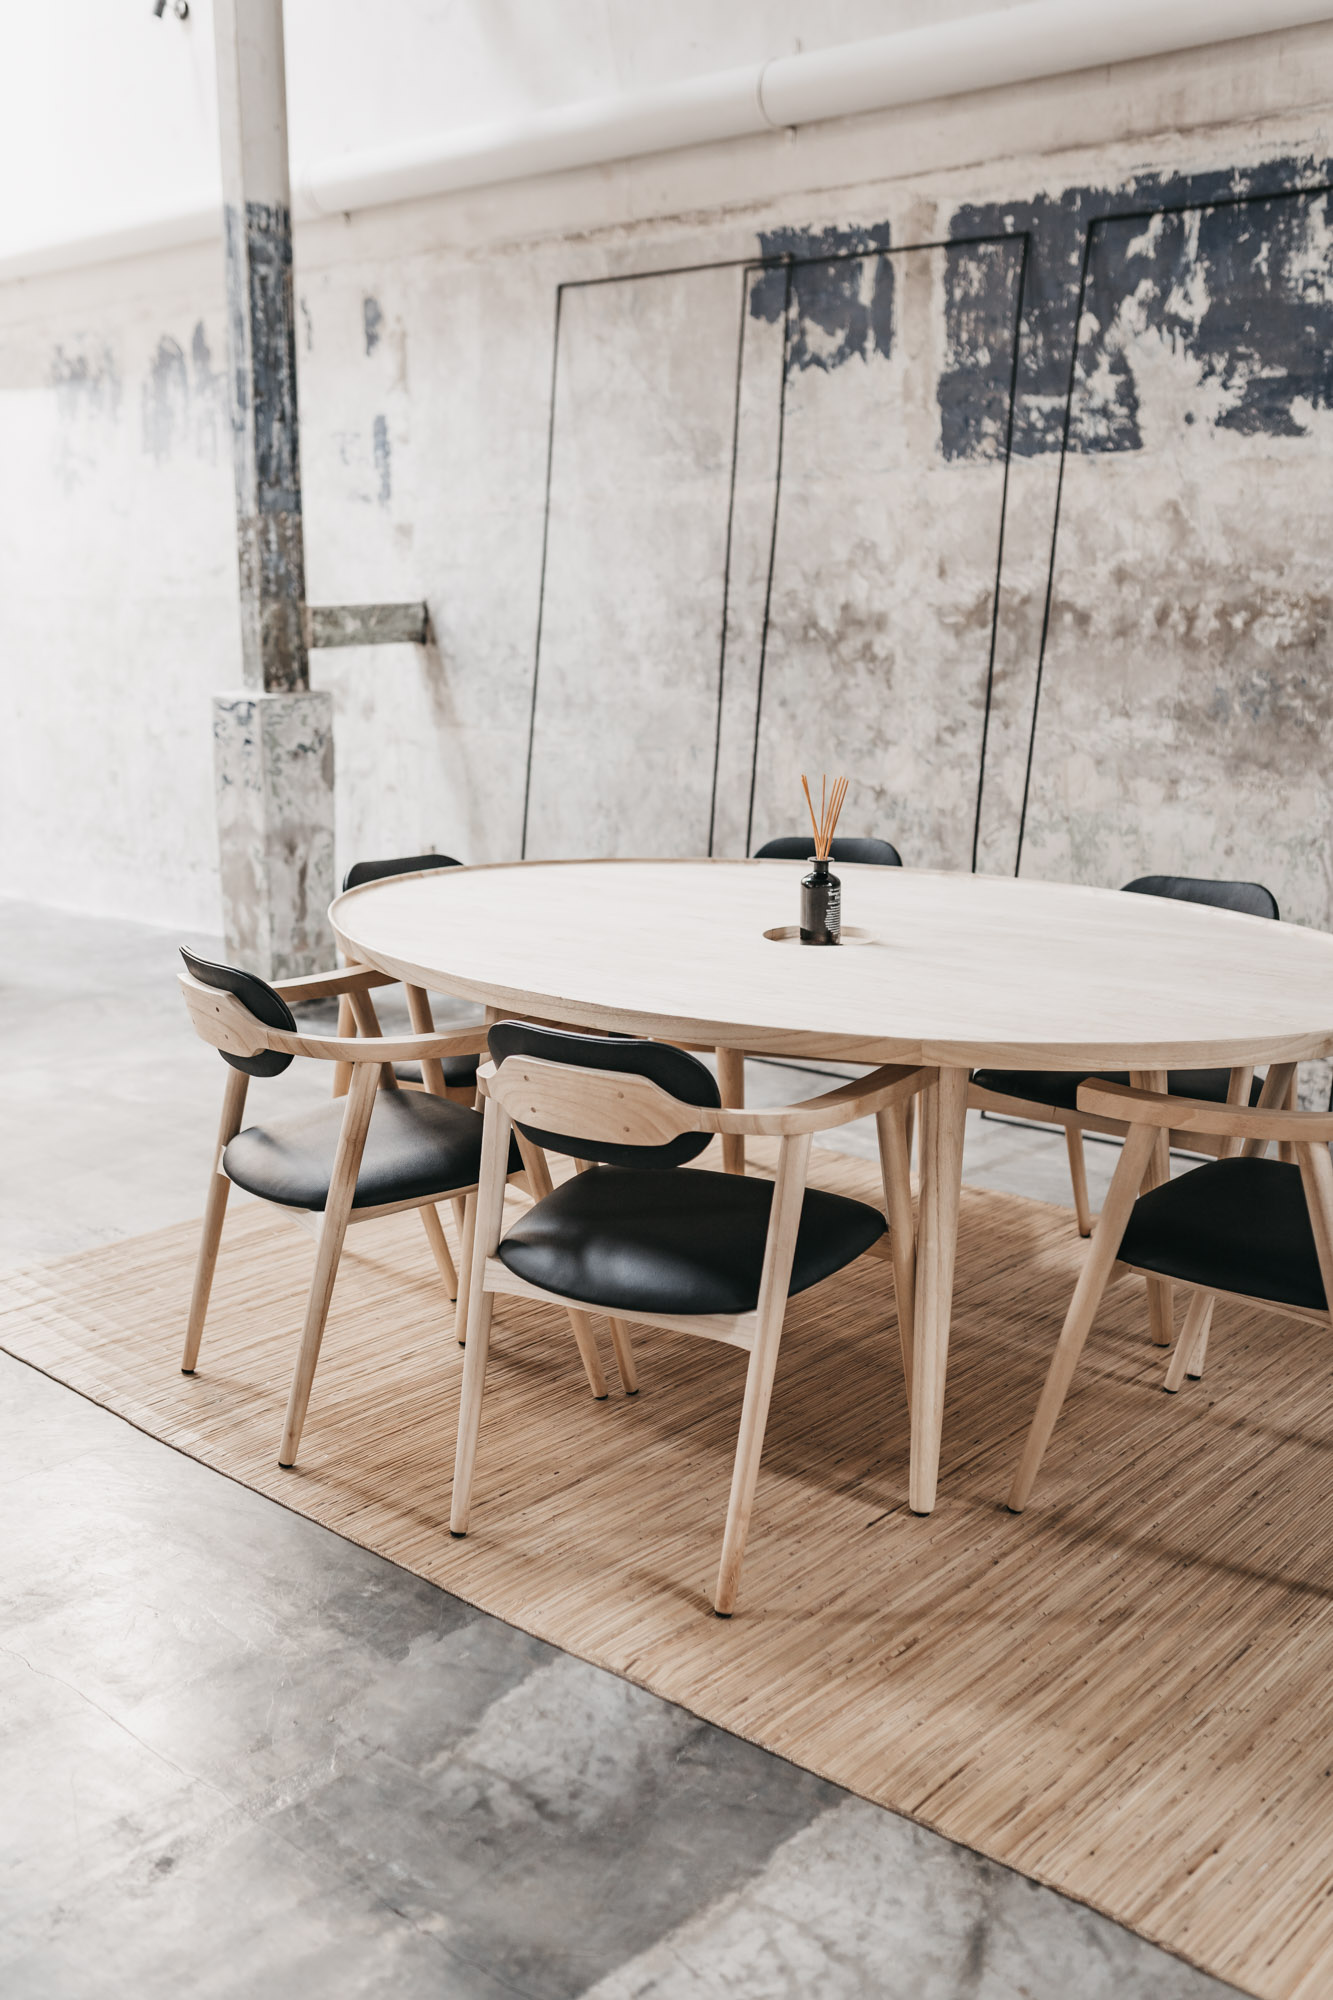 keira-mason-kinship-studio-communal-desk.jpg